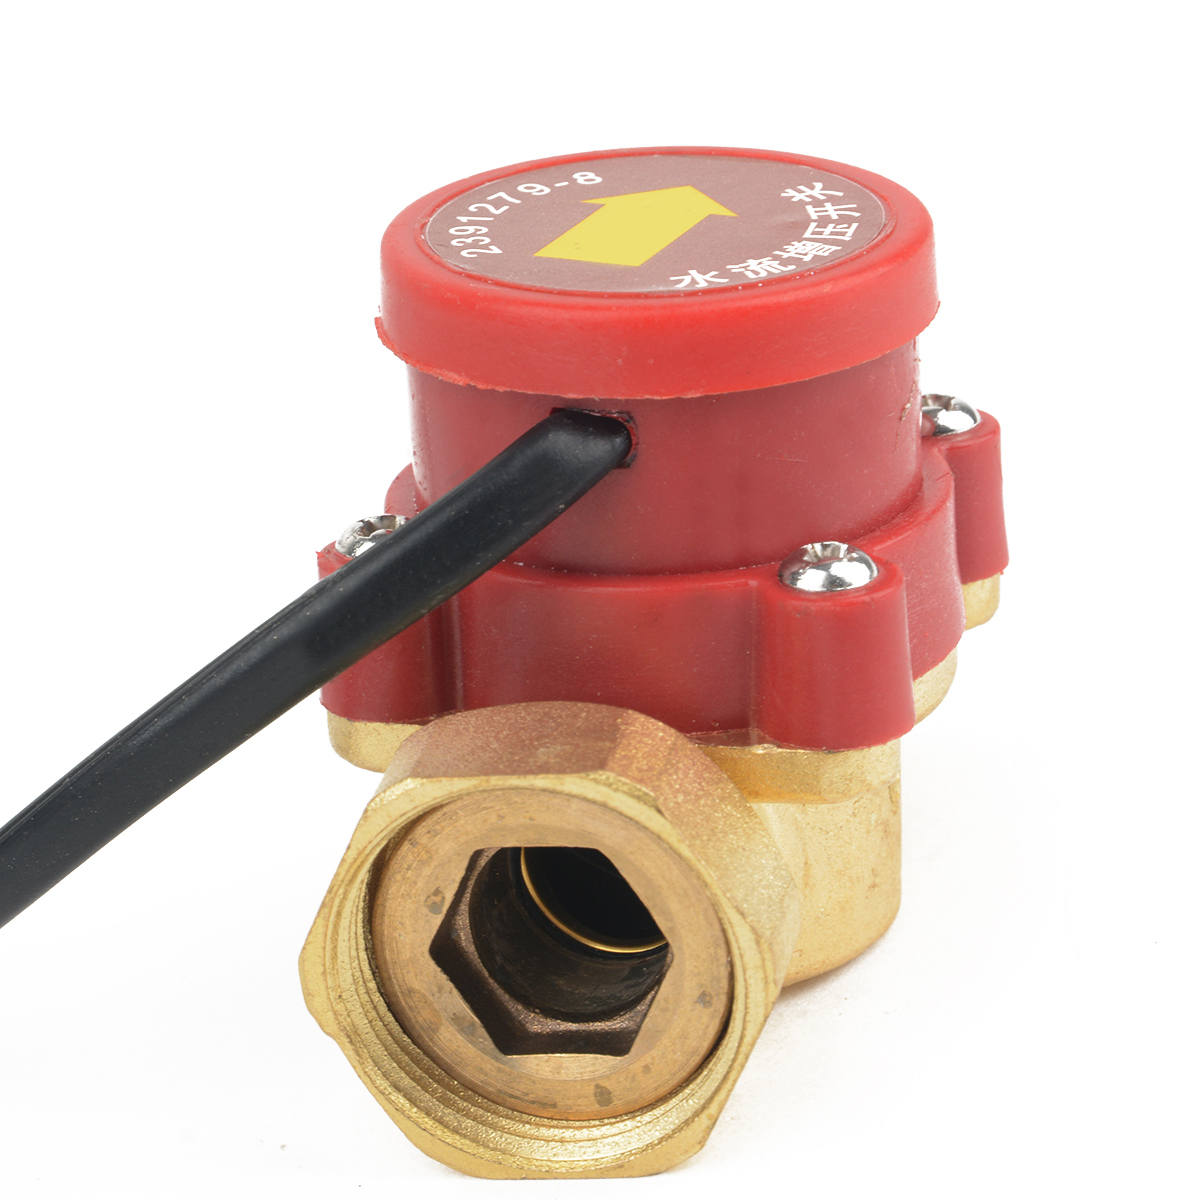 1Pc 120W Water Flow Switch 120W AC220V Water Flow Sensor Male Thread Connector Circulation Pump